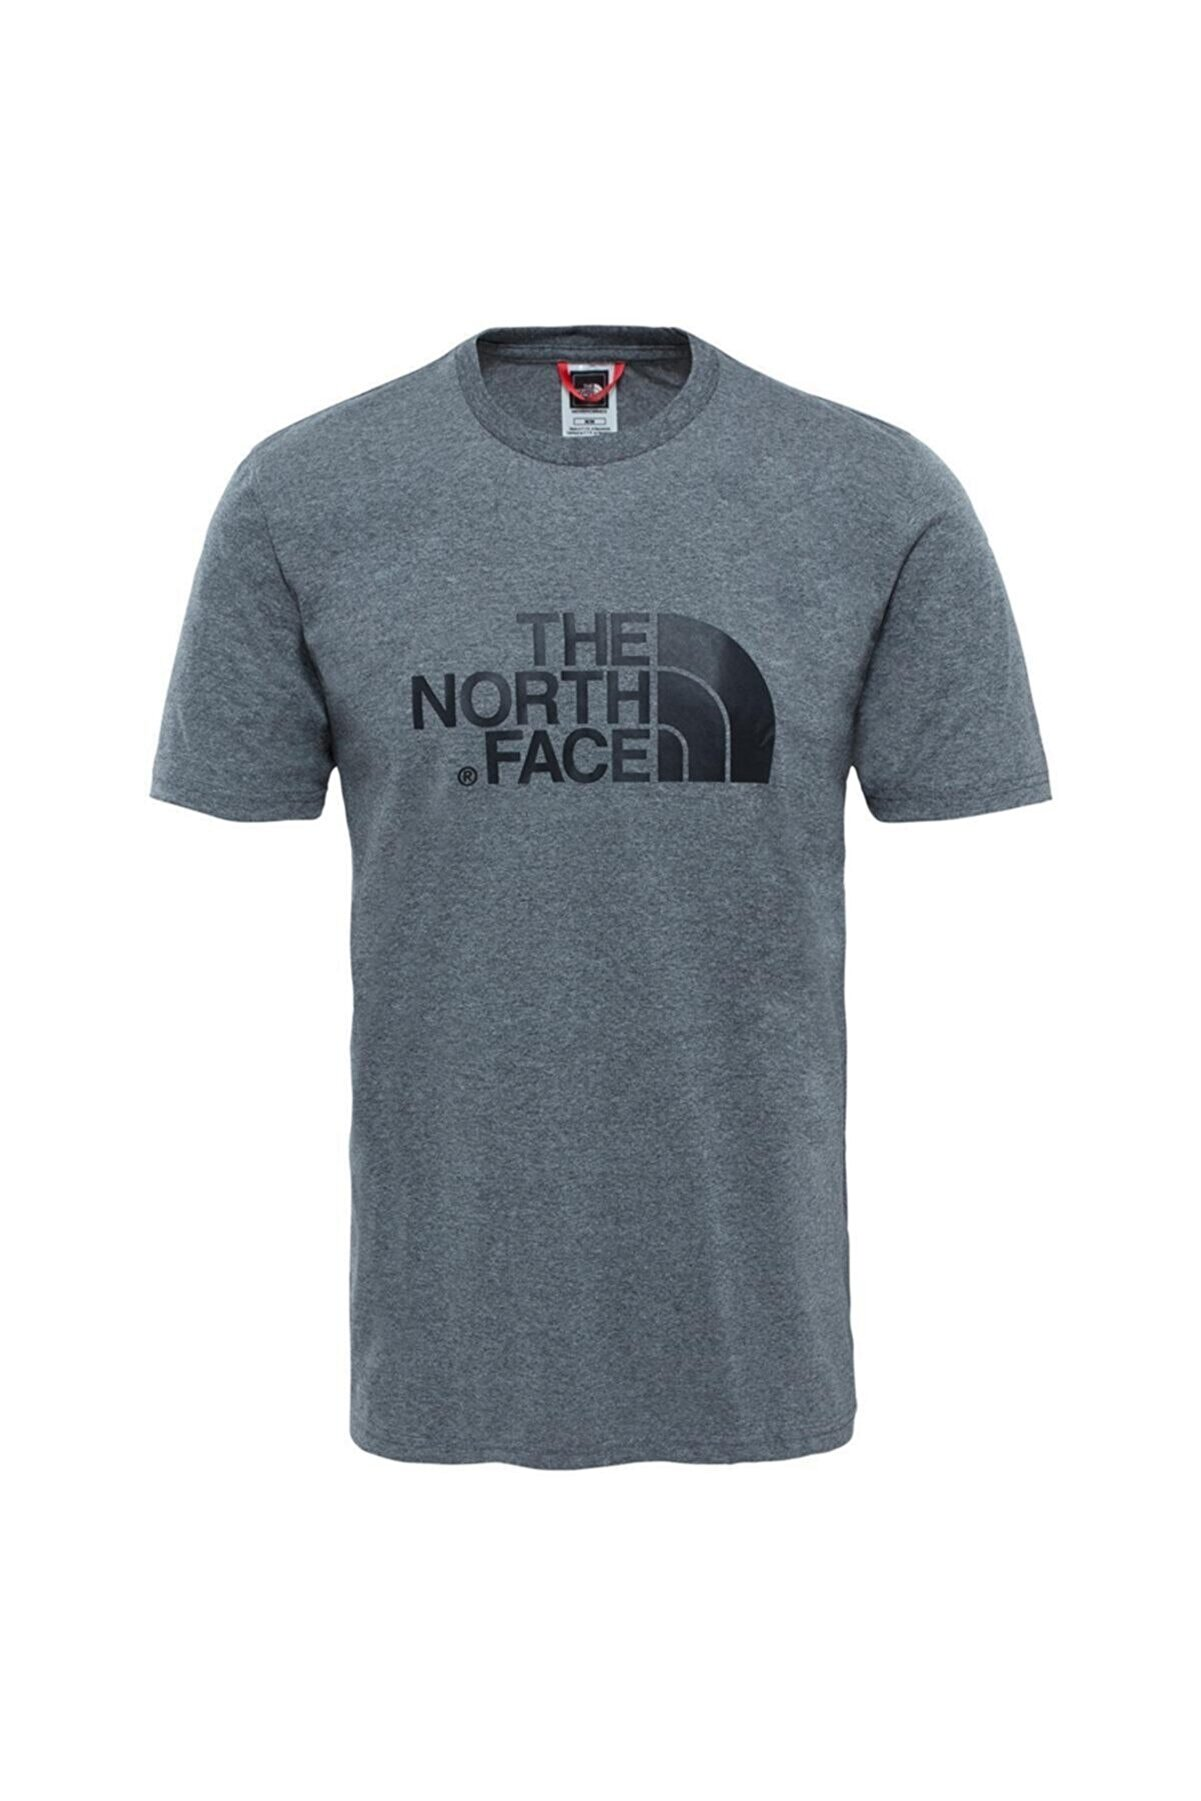 The North Face Easy Tee Erkek T-shirt - T92tx3jbv